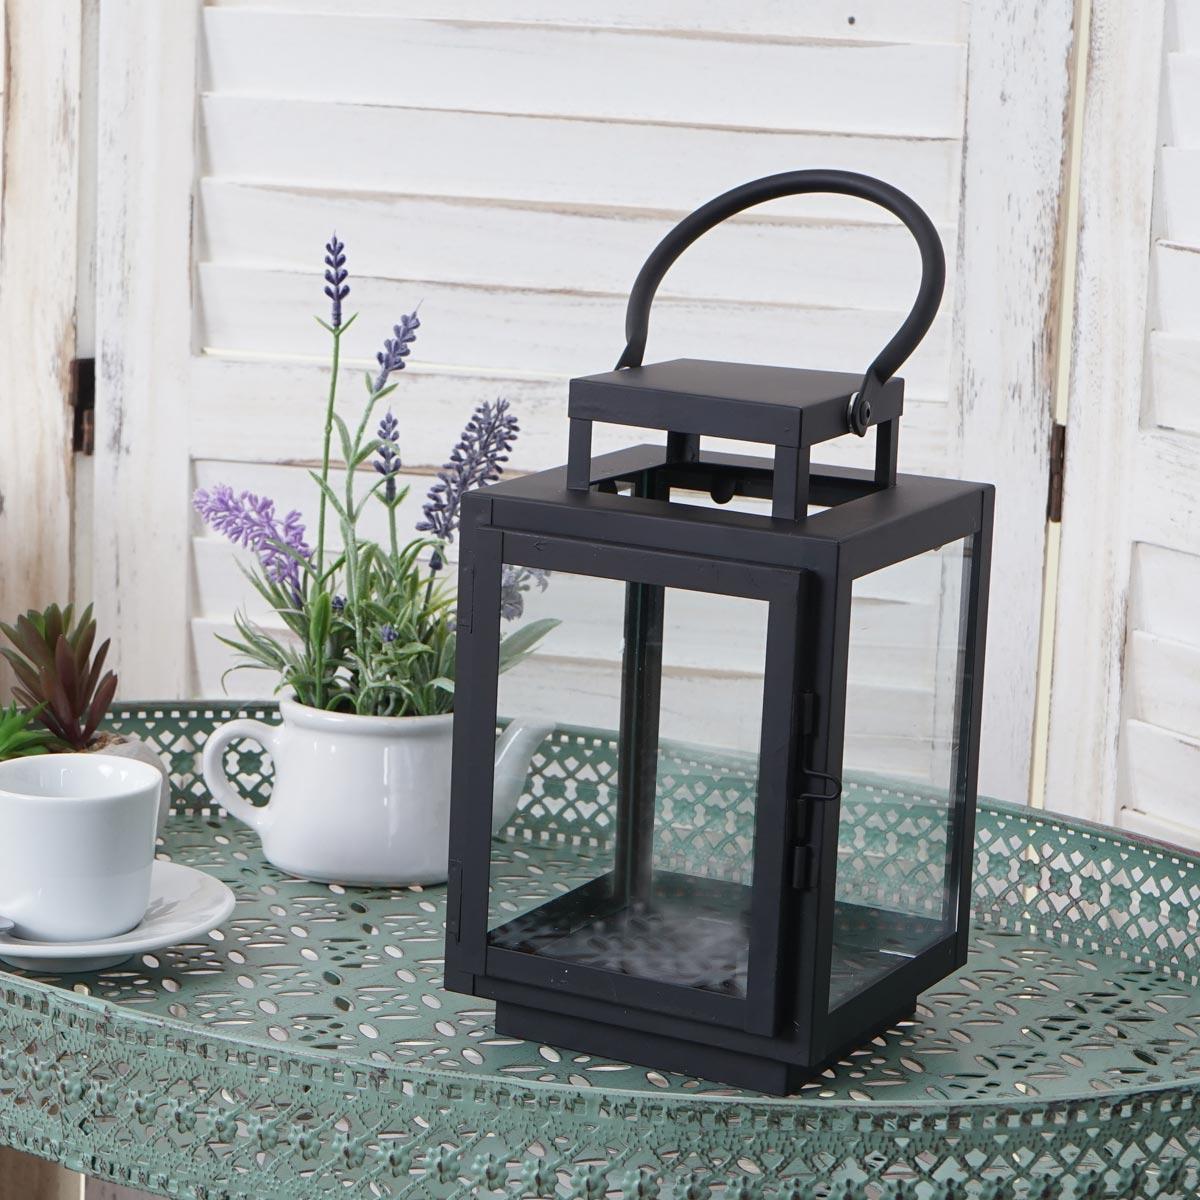 laterne hwc b40 windlicht gartenlaterne metall h he 22cm schwarz. Black Bedroom Furniture Sets. Home Design Ideas